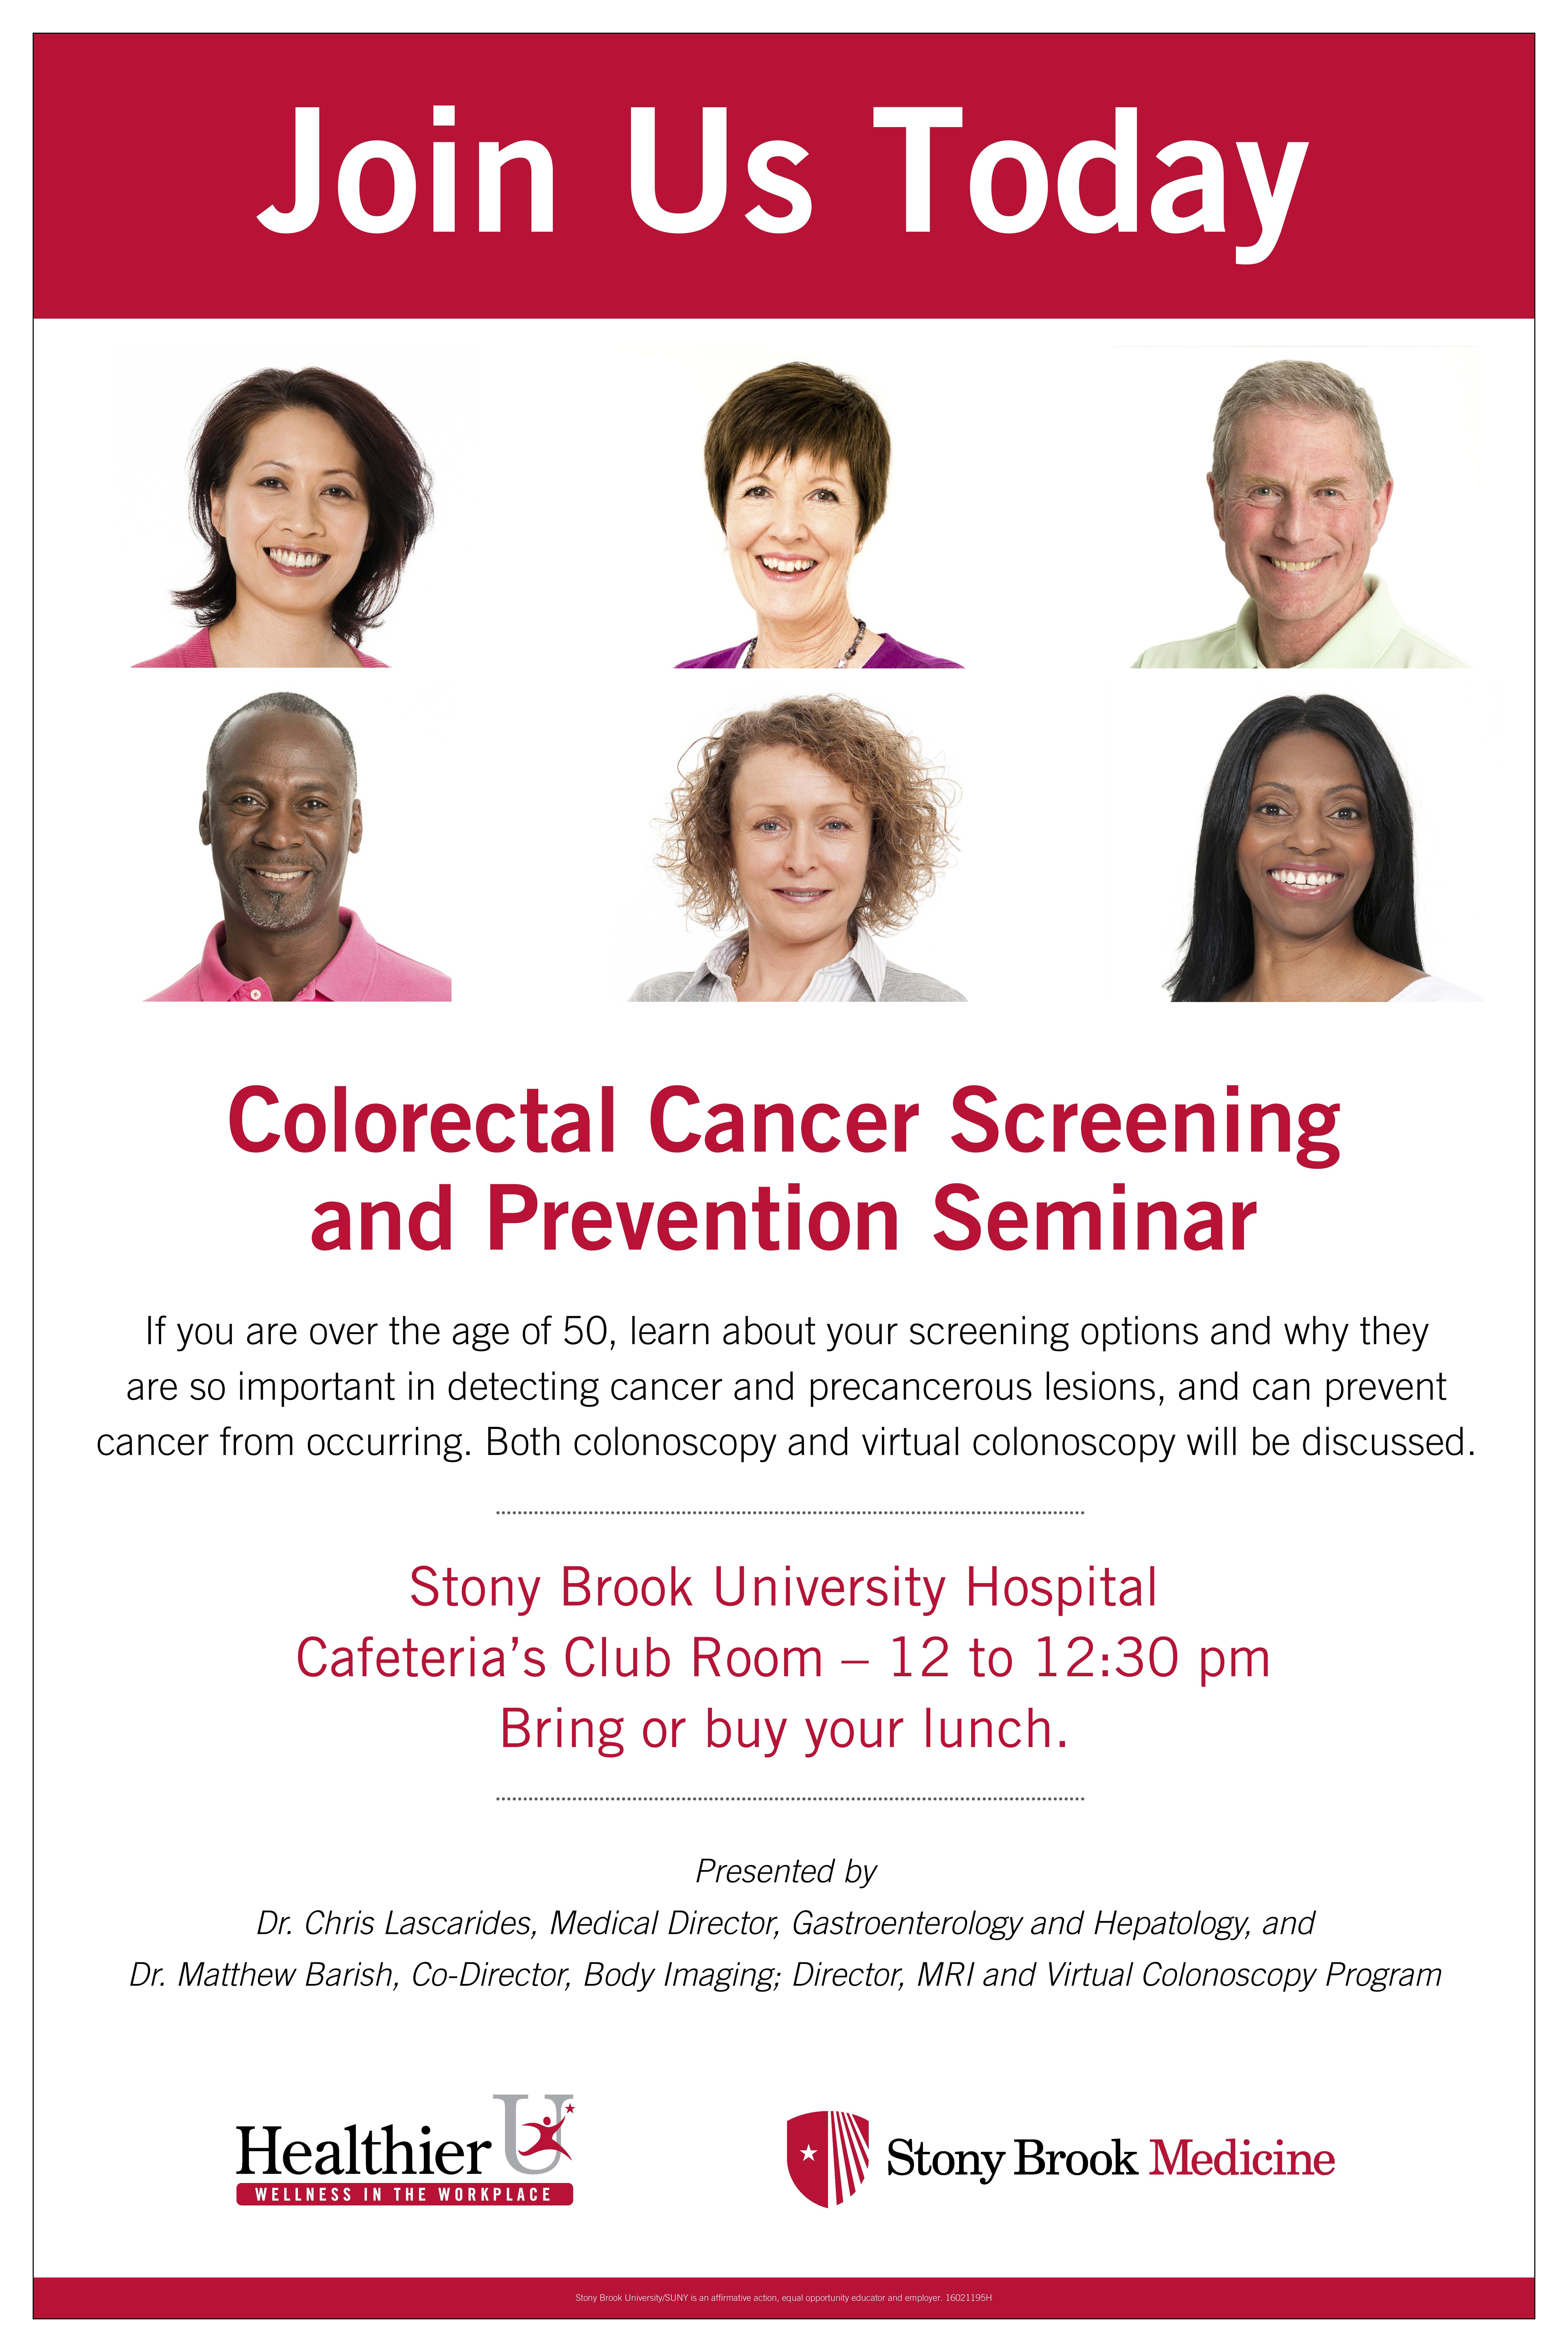 Colonoscopy Room: Colorectal Cancer Screening & Prevention Seminar TODAY